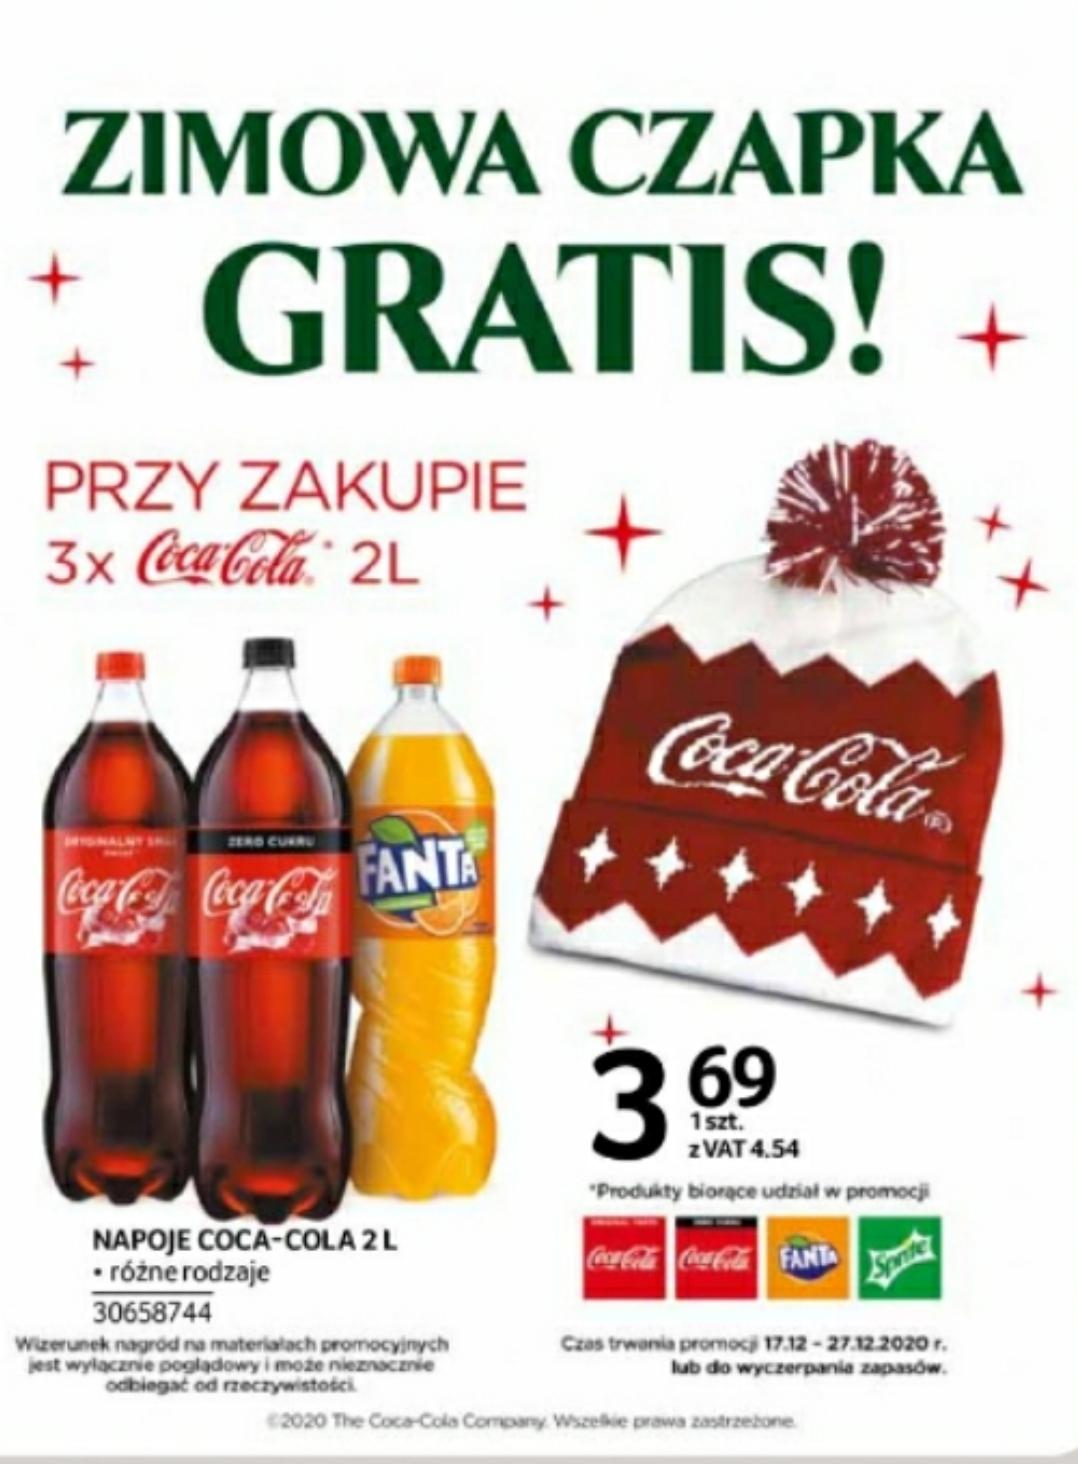 Coca-Cola,Fanta,Sprite 3 x 2l + czapka zimowa Coca-cola gratis w Selgros 17.12-27.12.2020